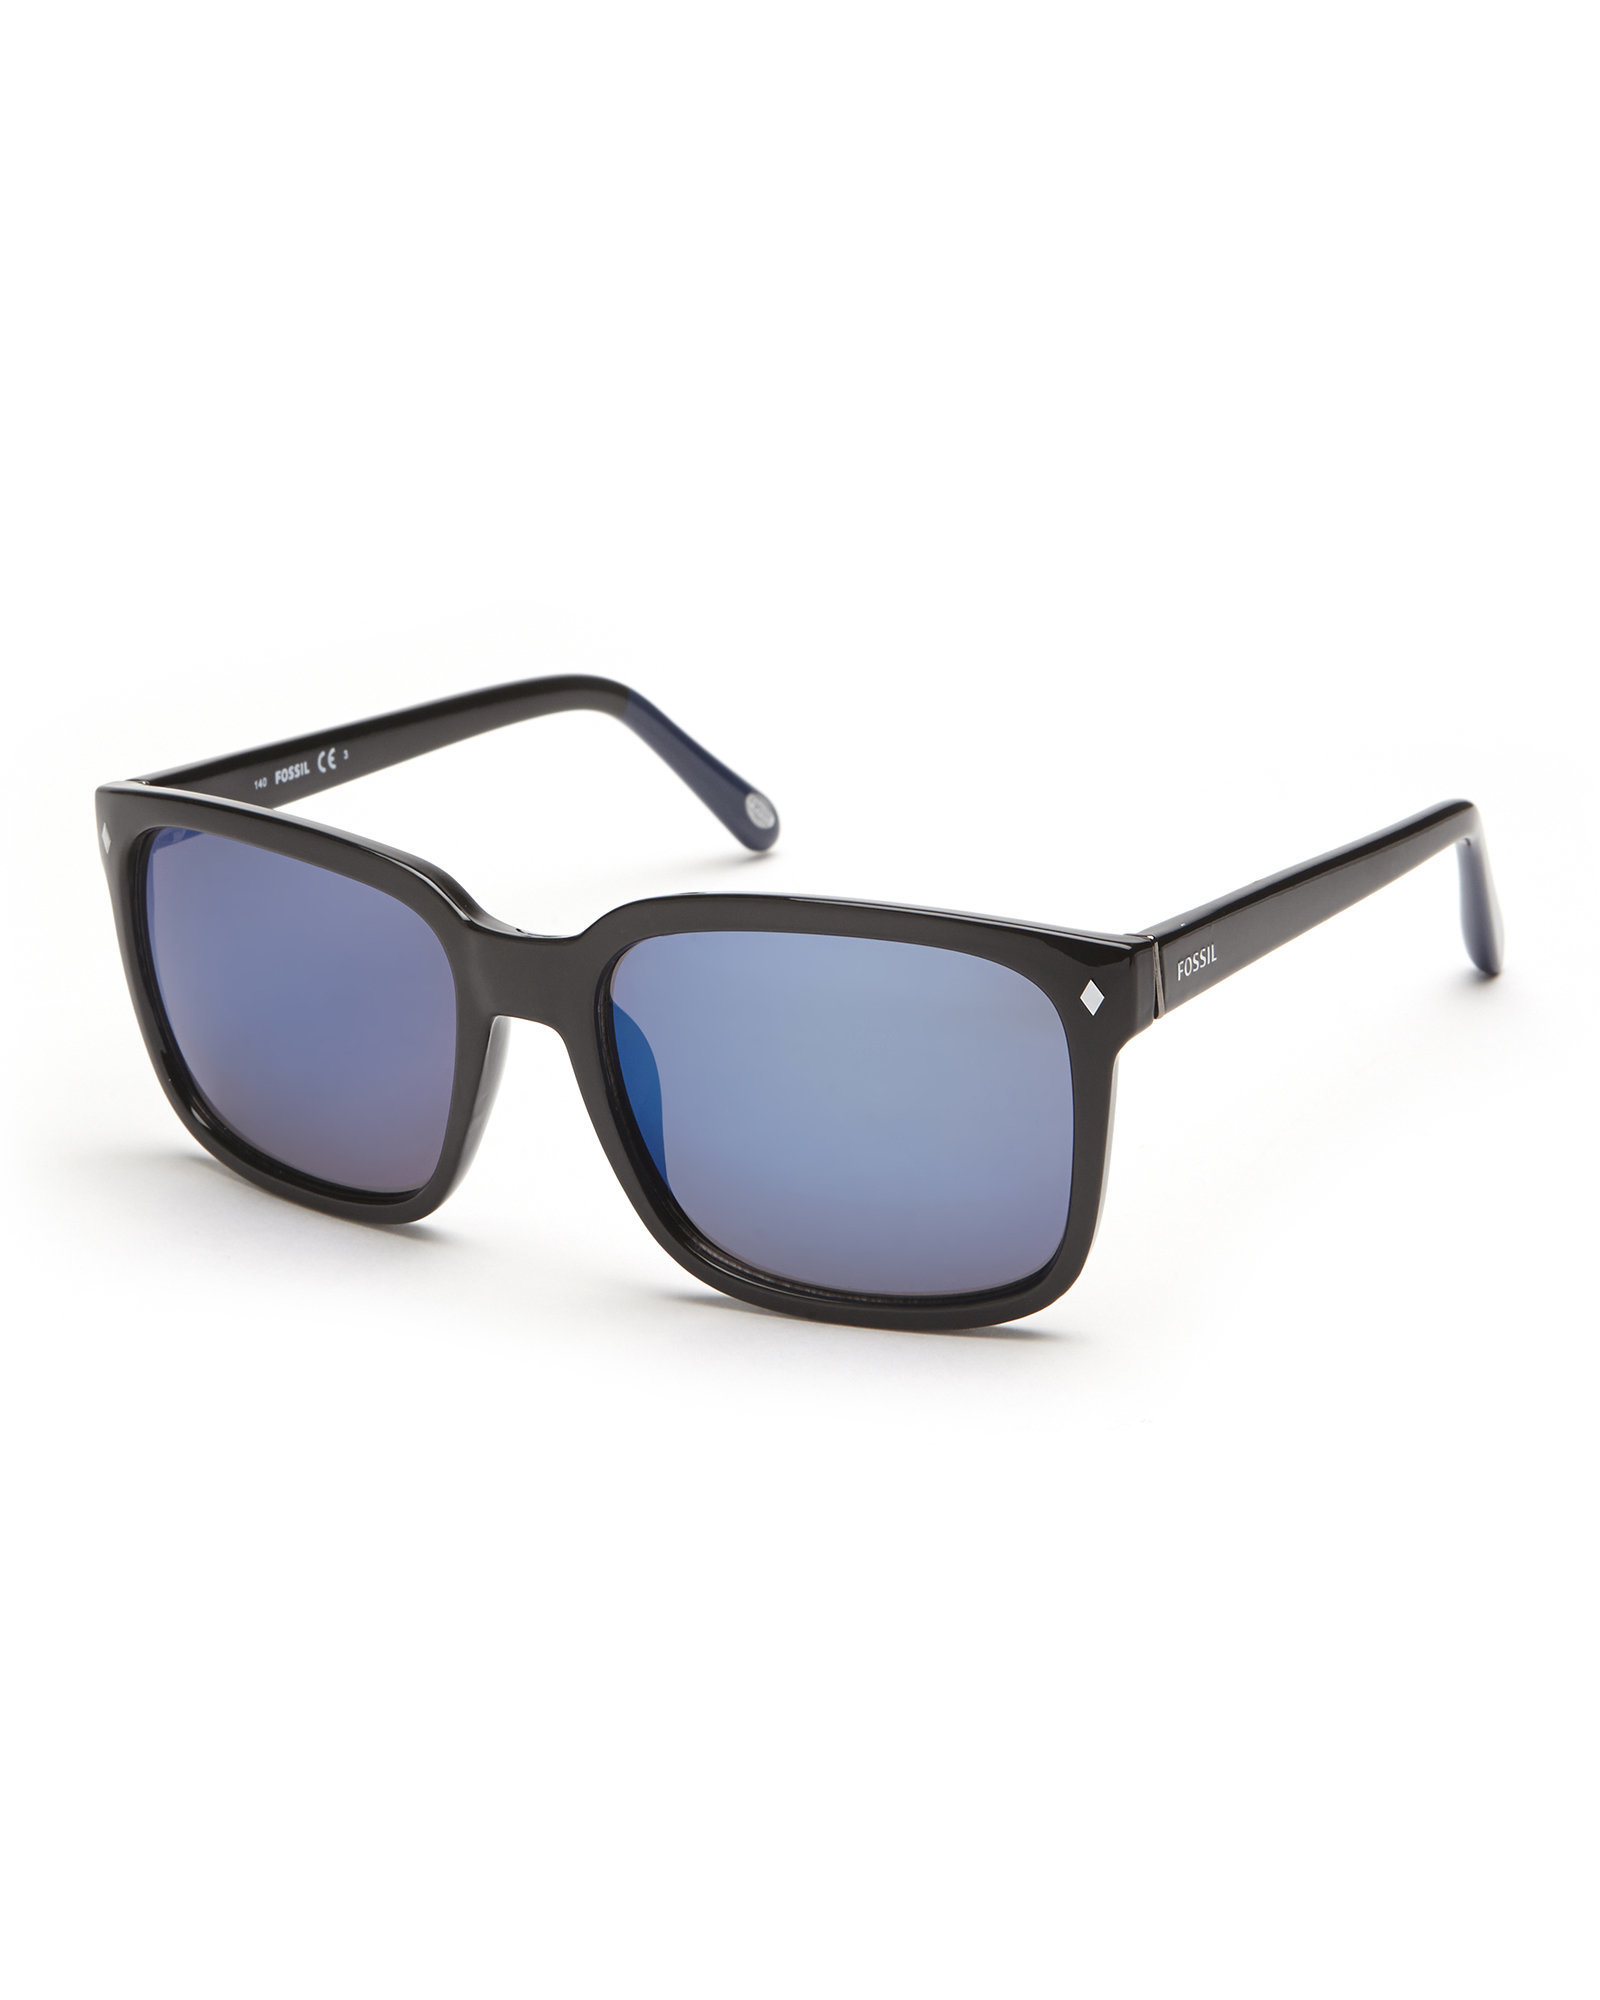 b8fbdf6356 Lyst - Fossil Black 3035 S Xl Wayfarer Sunglasses in Blue for Men